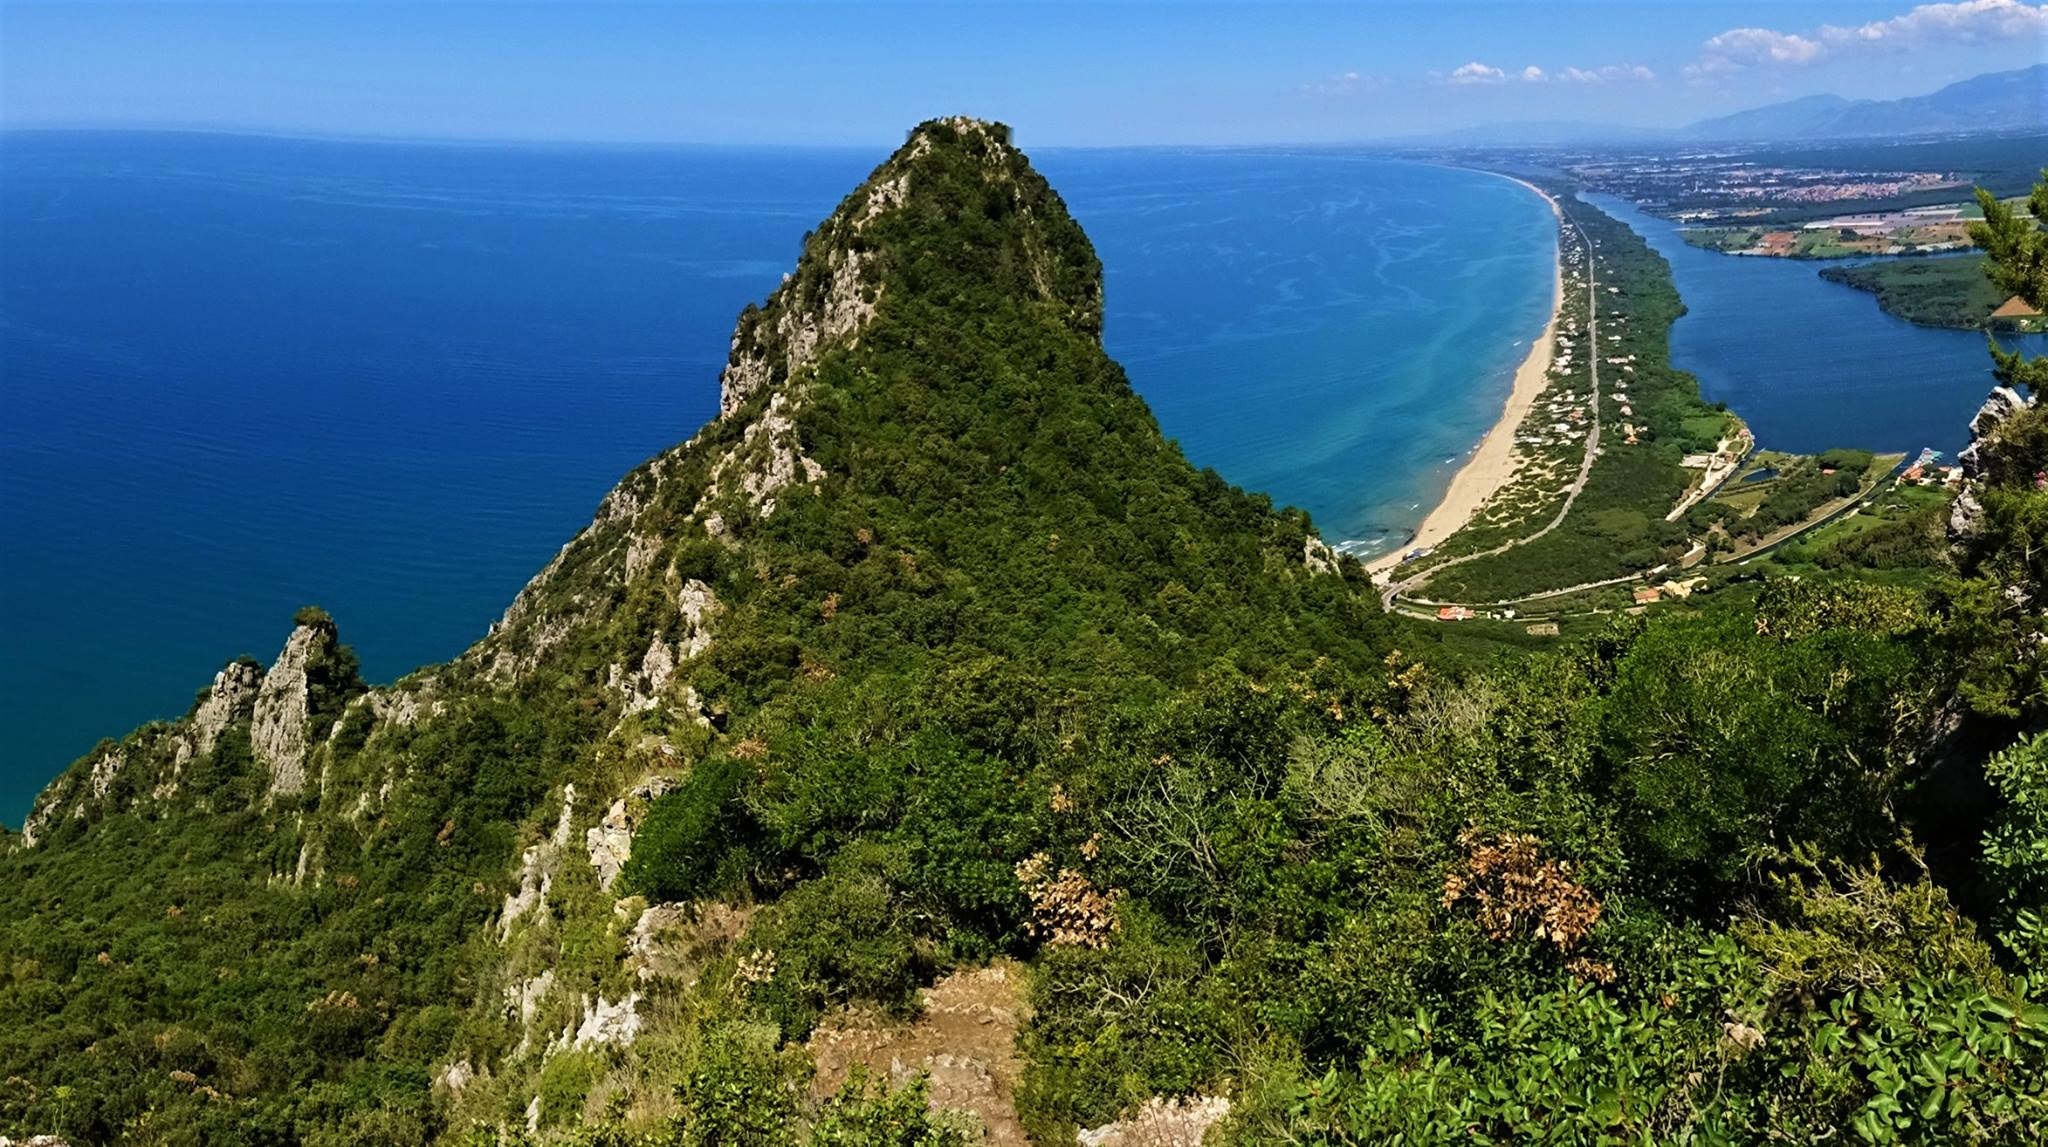 Monte Circeo